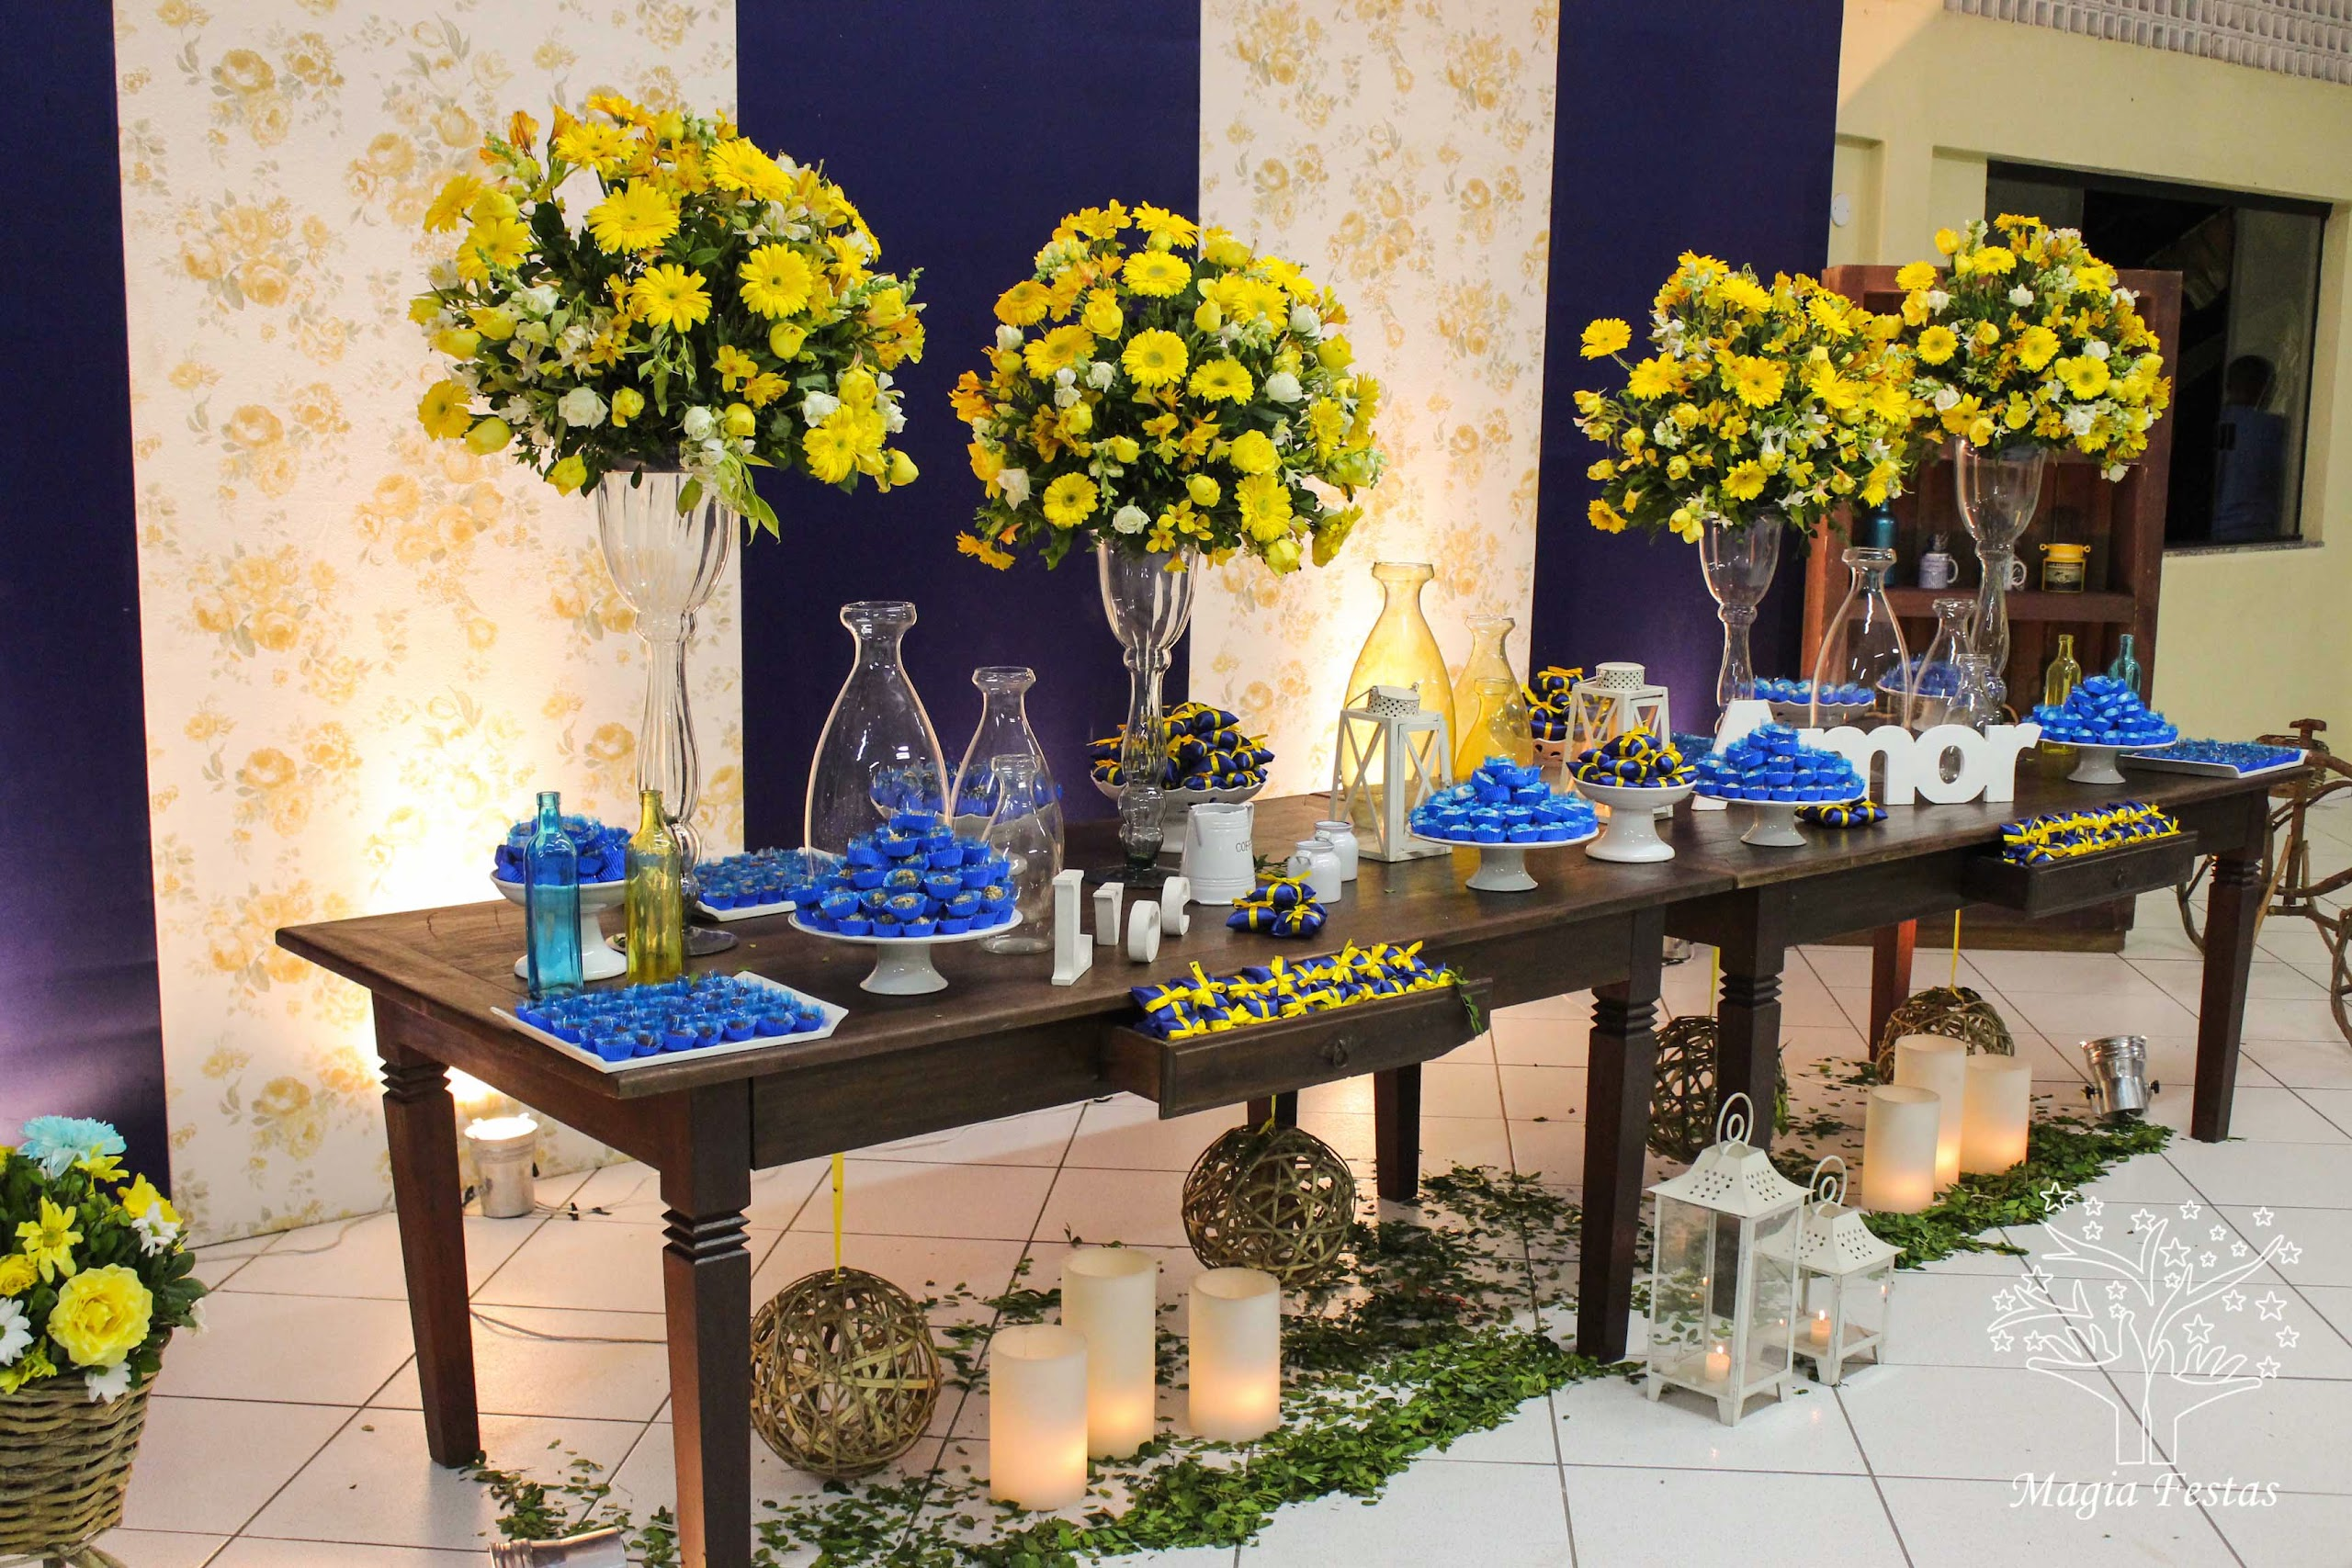 decoracao de igreja para casamento azul e amarelo : decoracao de igreja para casamento azul e amarelo:quinta-feira, 29 de maio de 2014